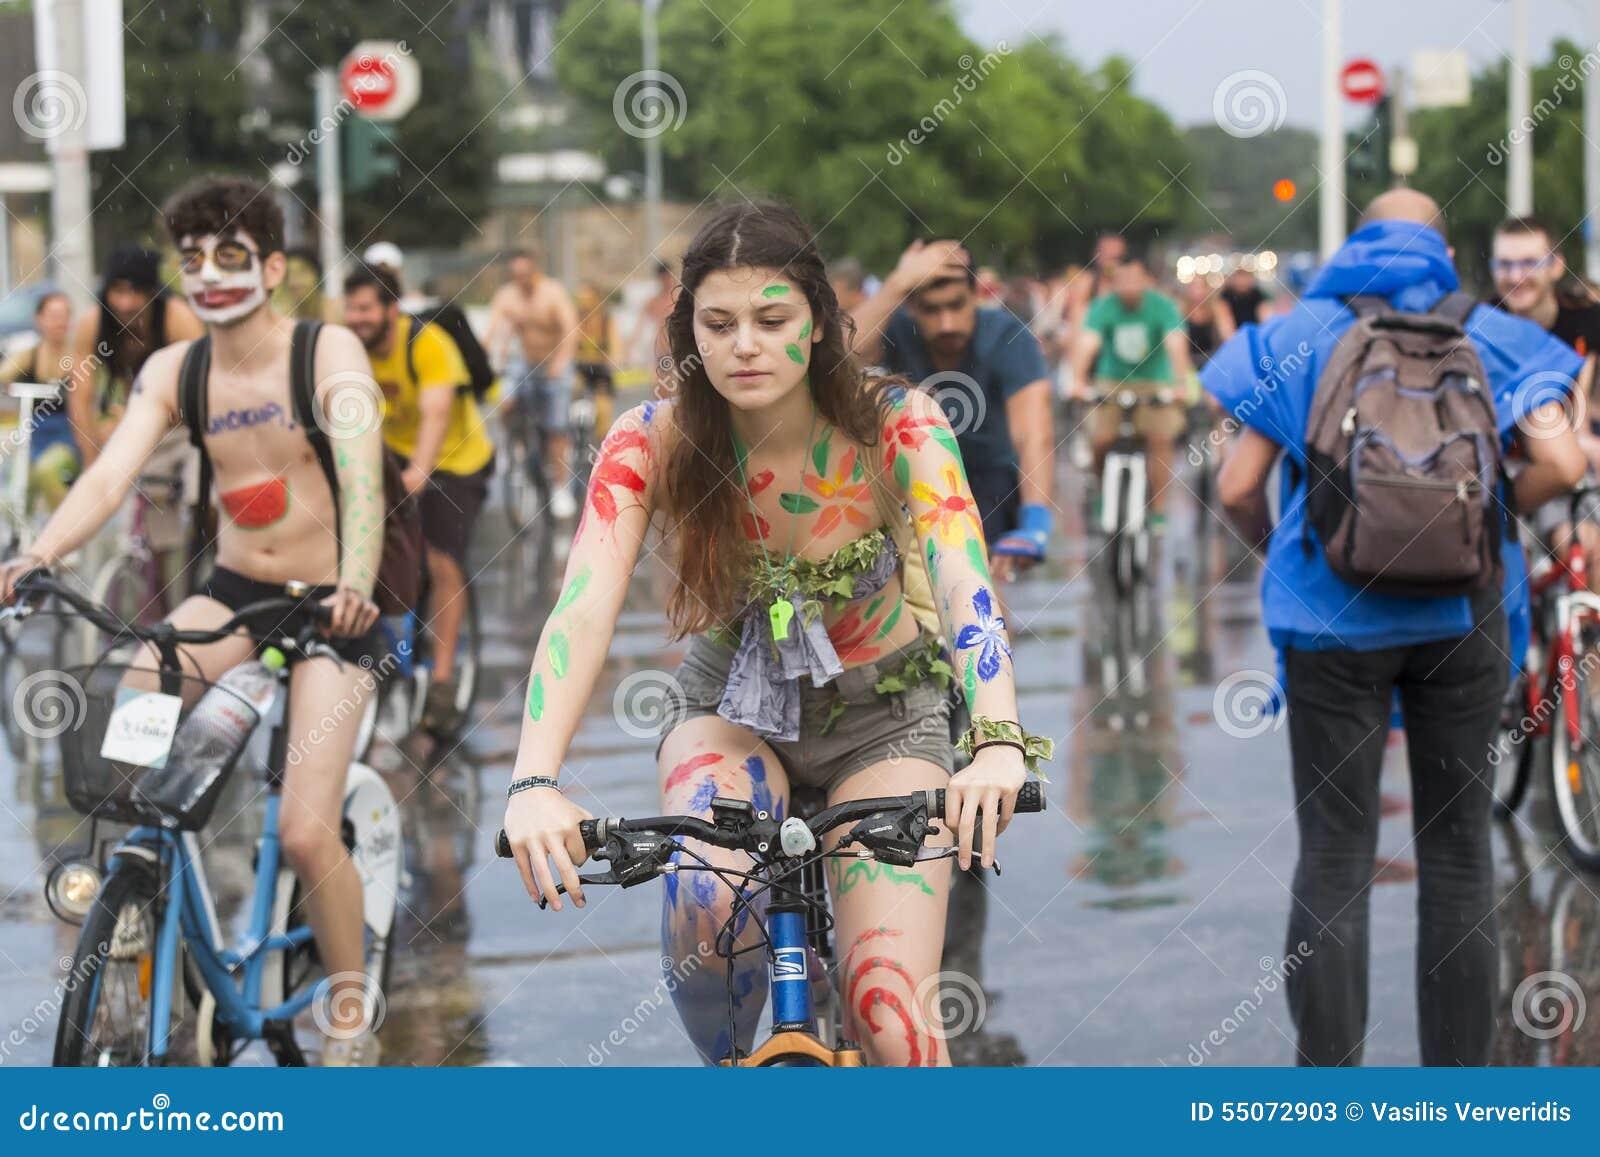 World Naked Bike Ride Los Angeles 2015 (NSFW slide show)